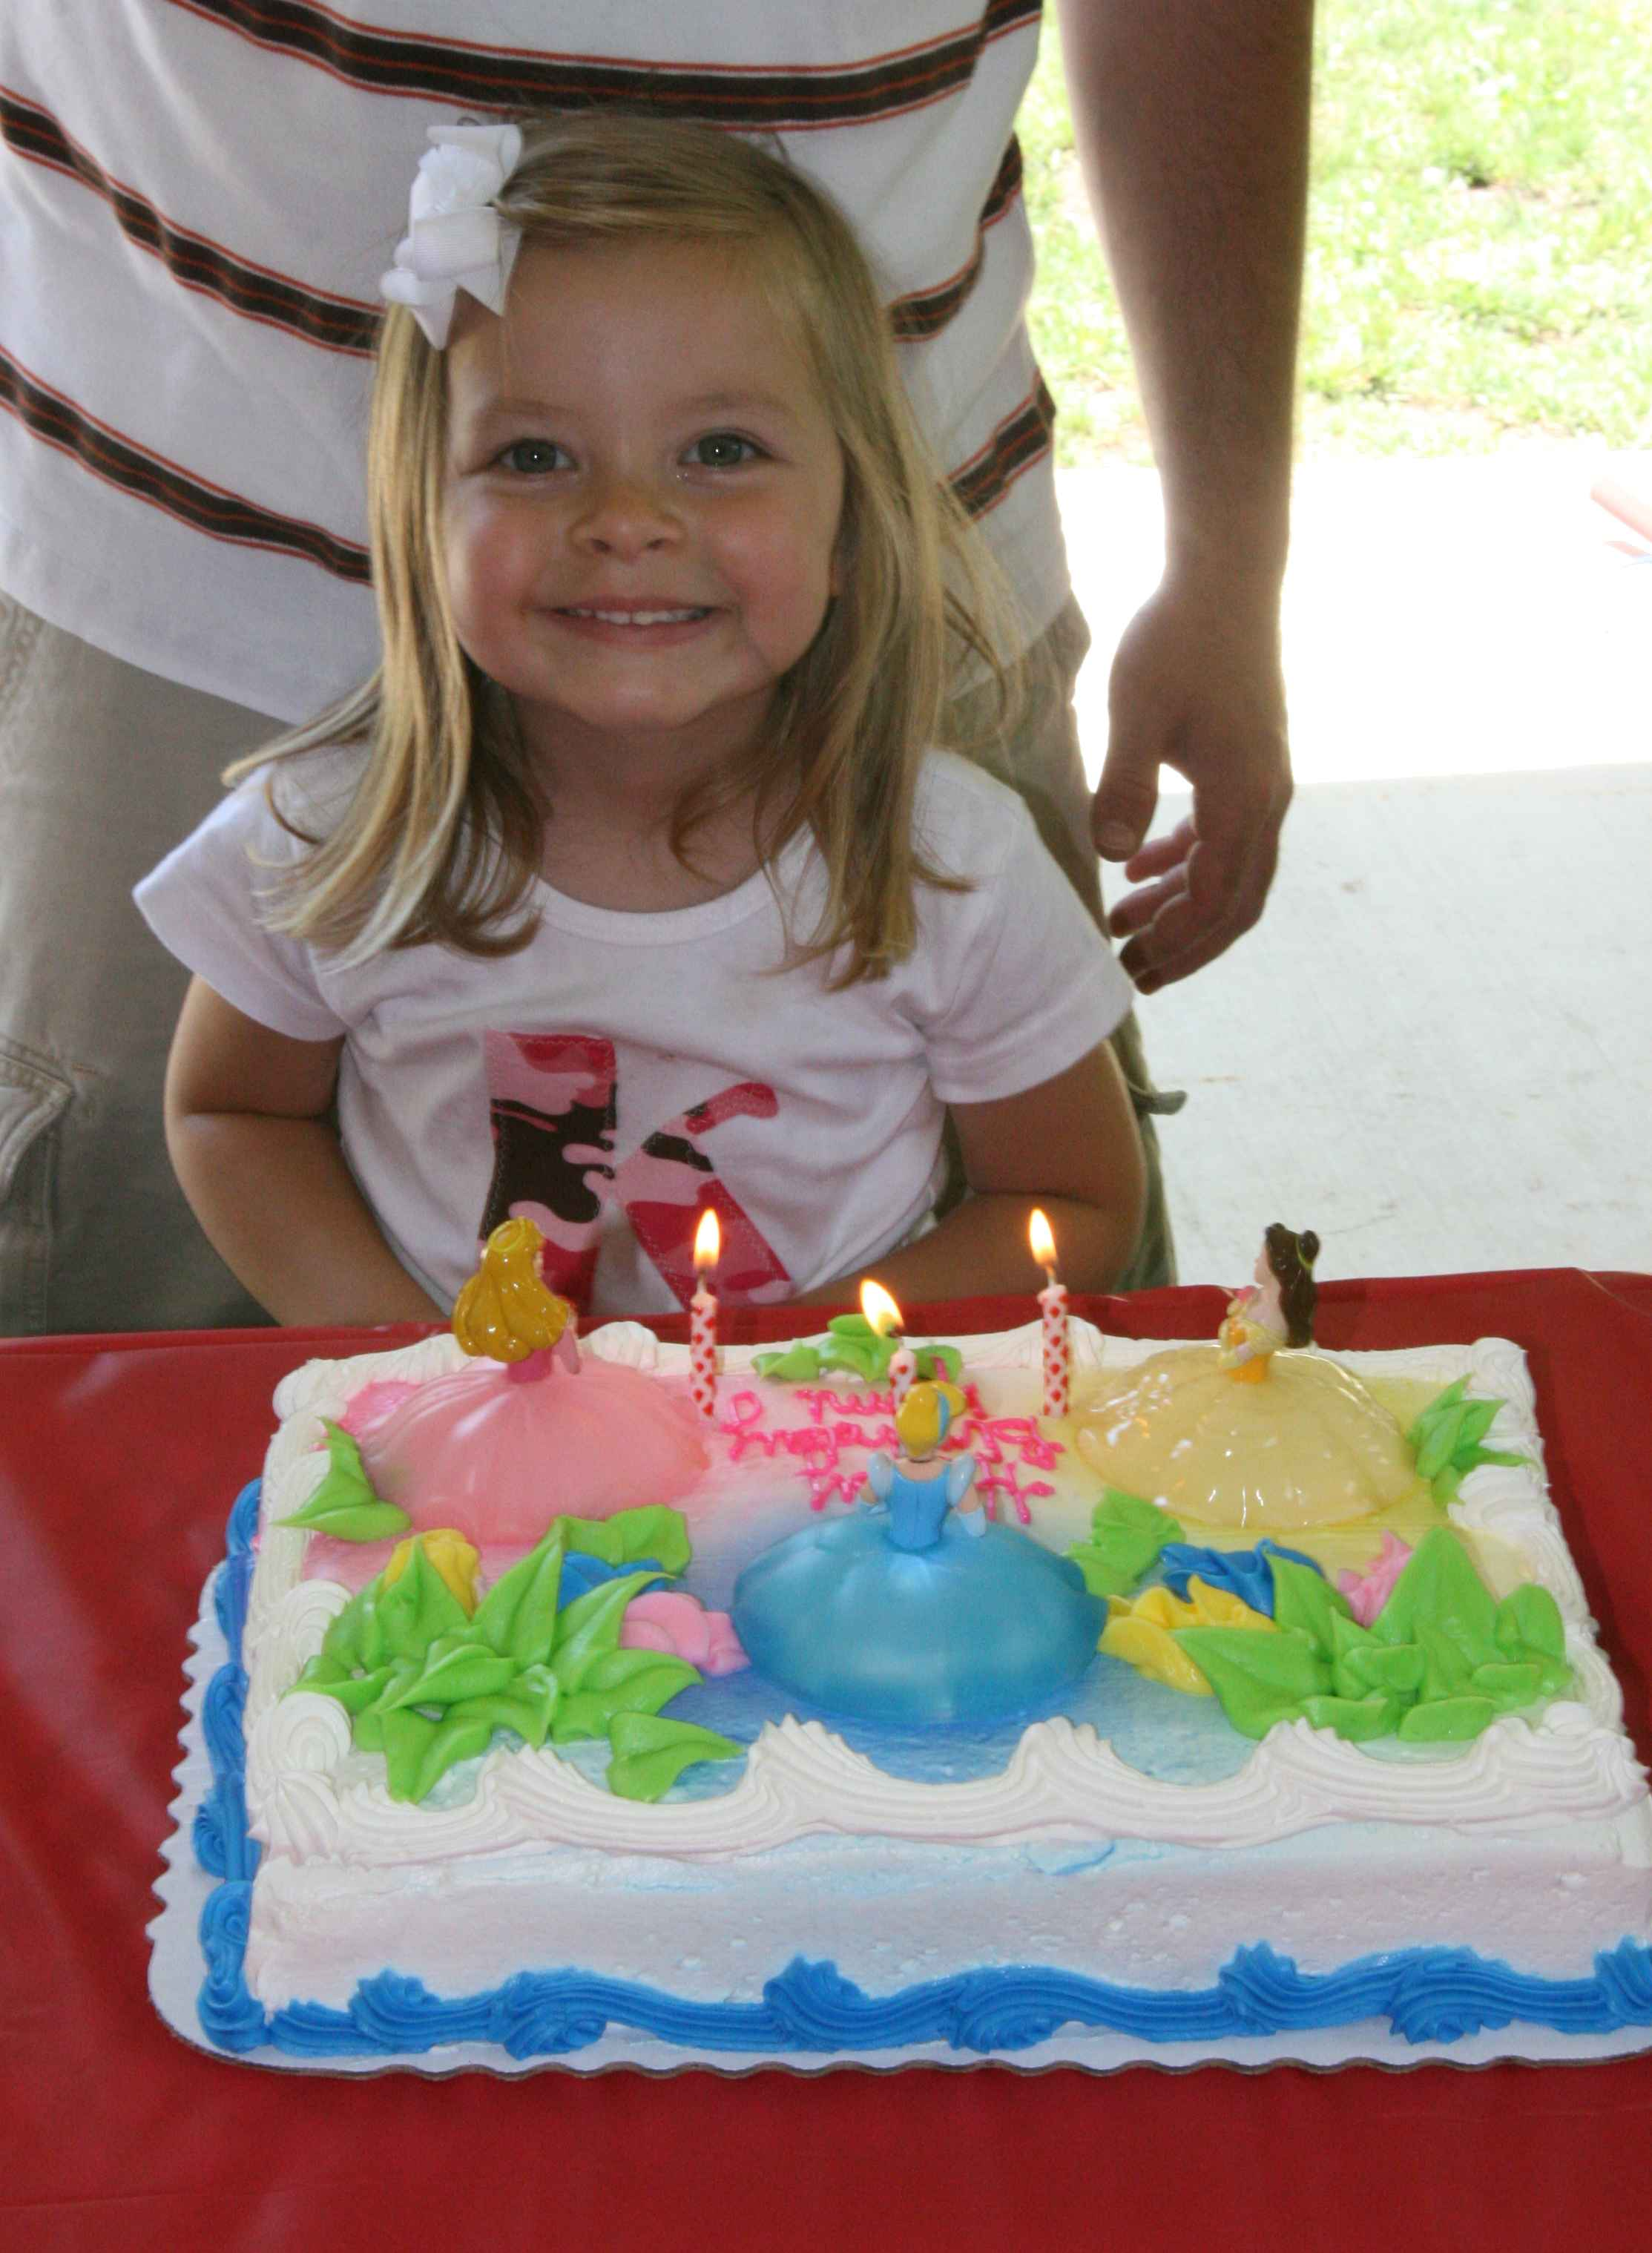 kams_birthdaycake_edit_sm